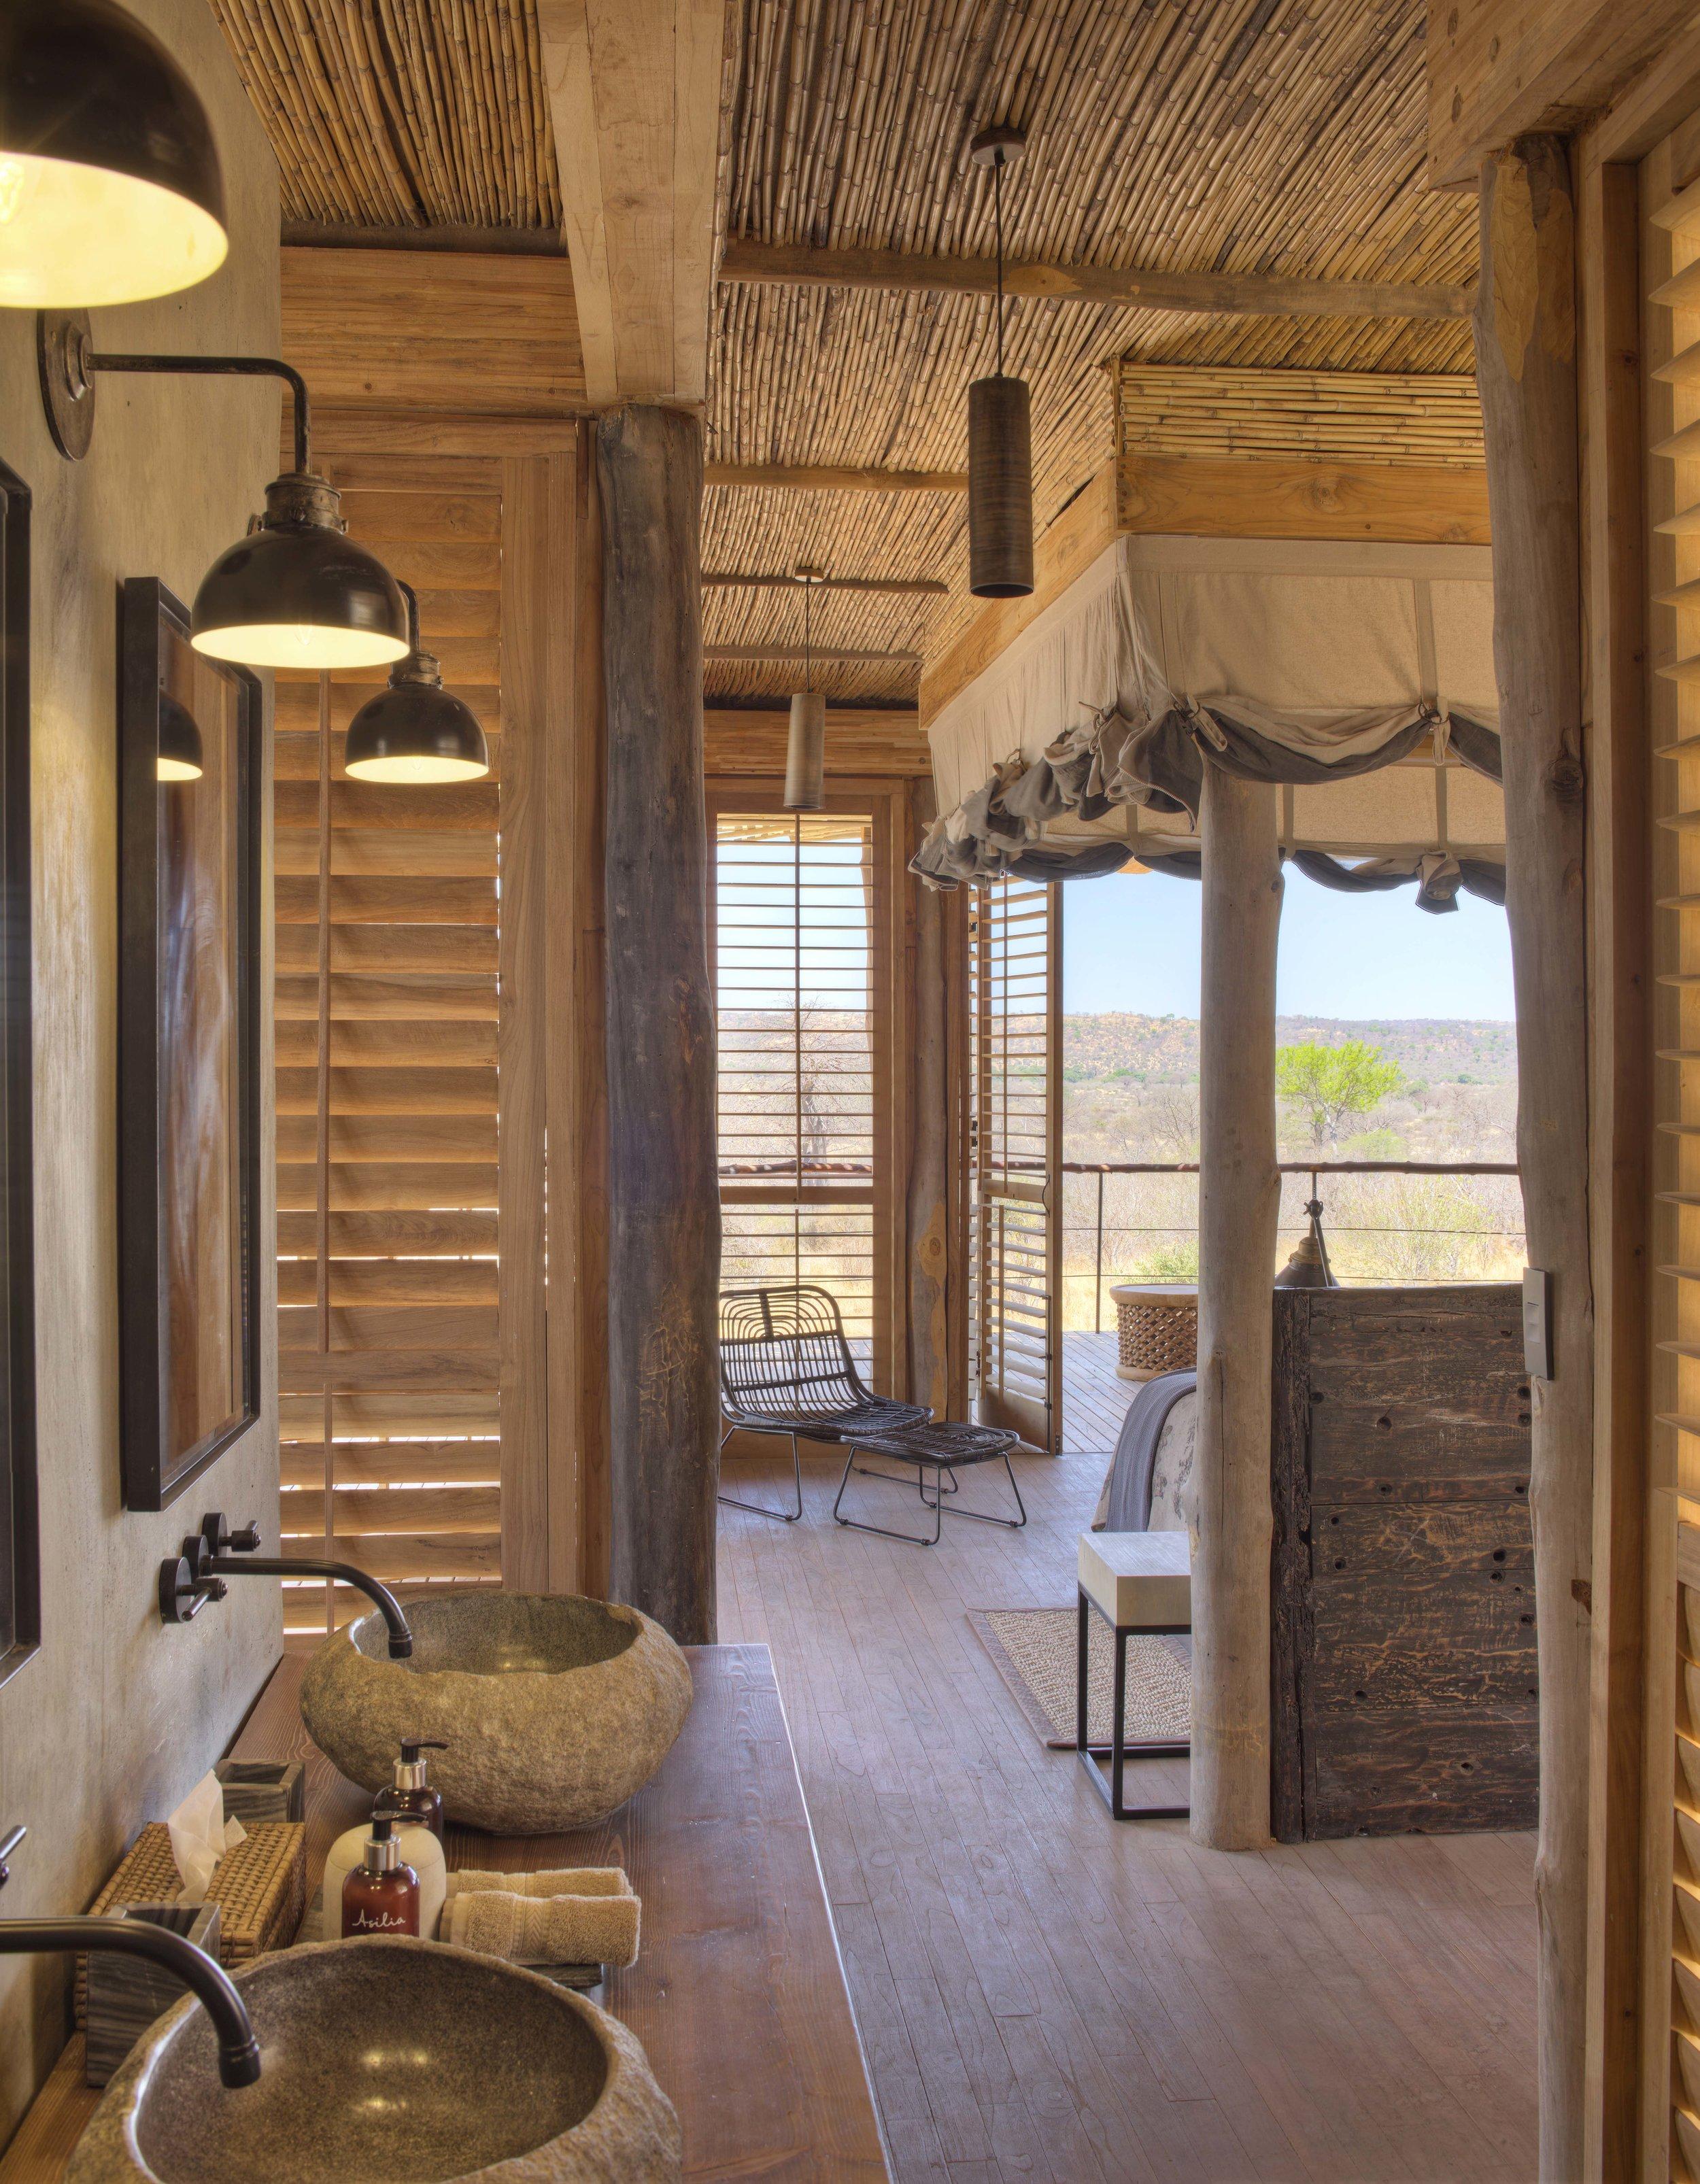 Jabali-en-suite-bathroom-with-view-into-room.jpg